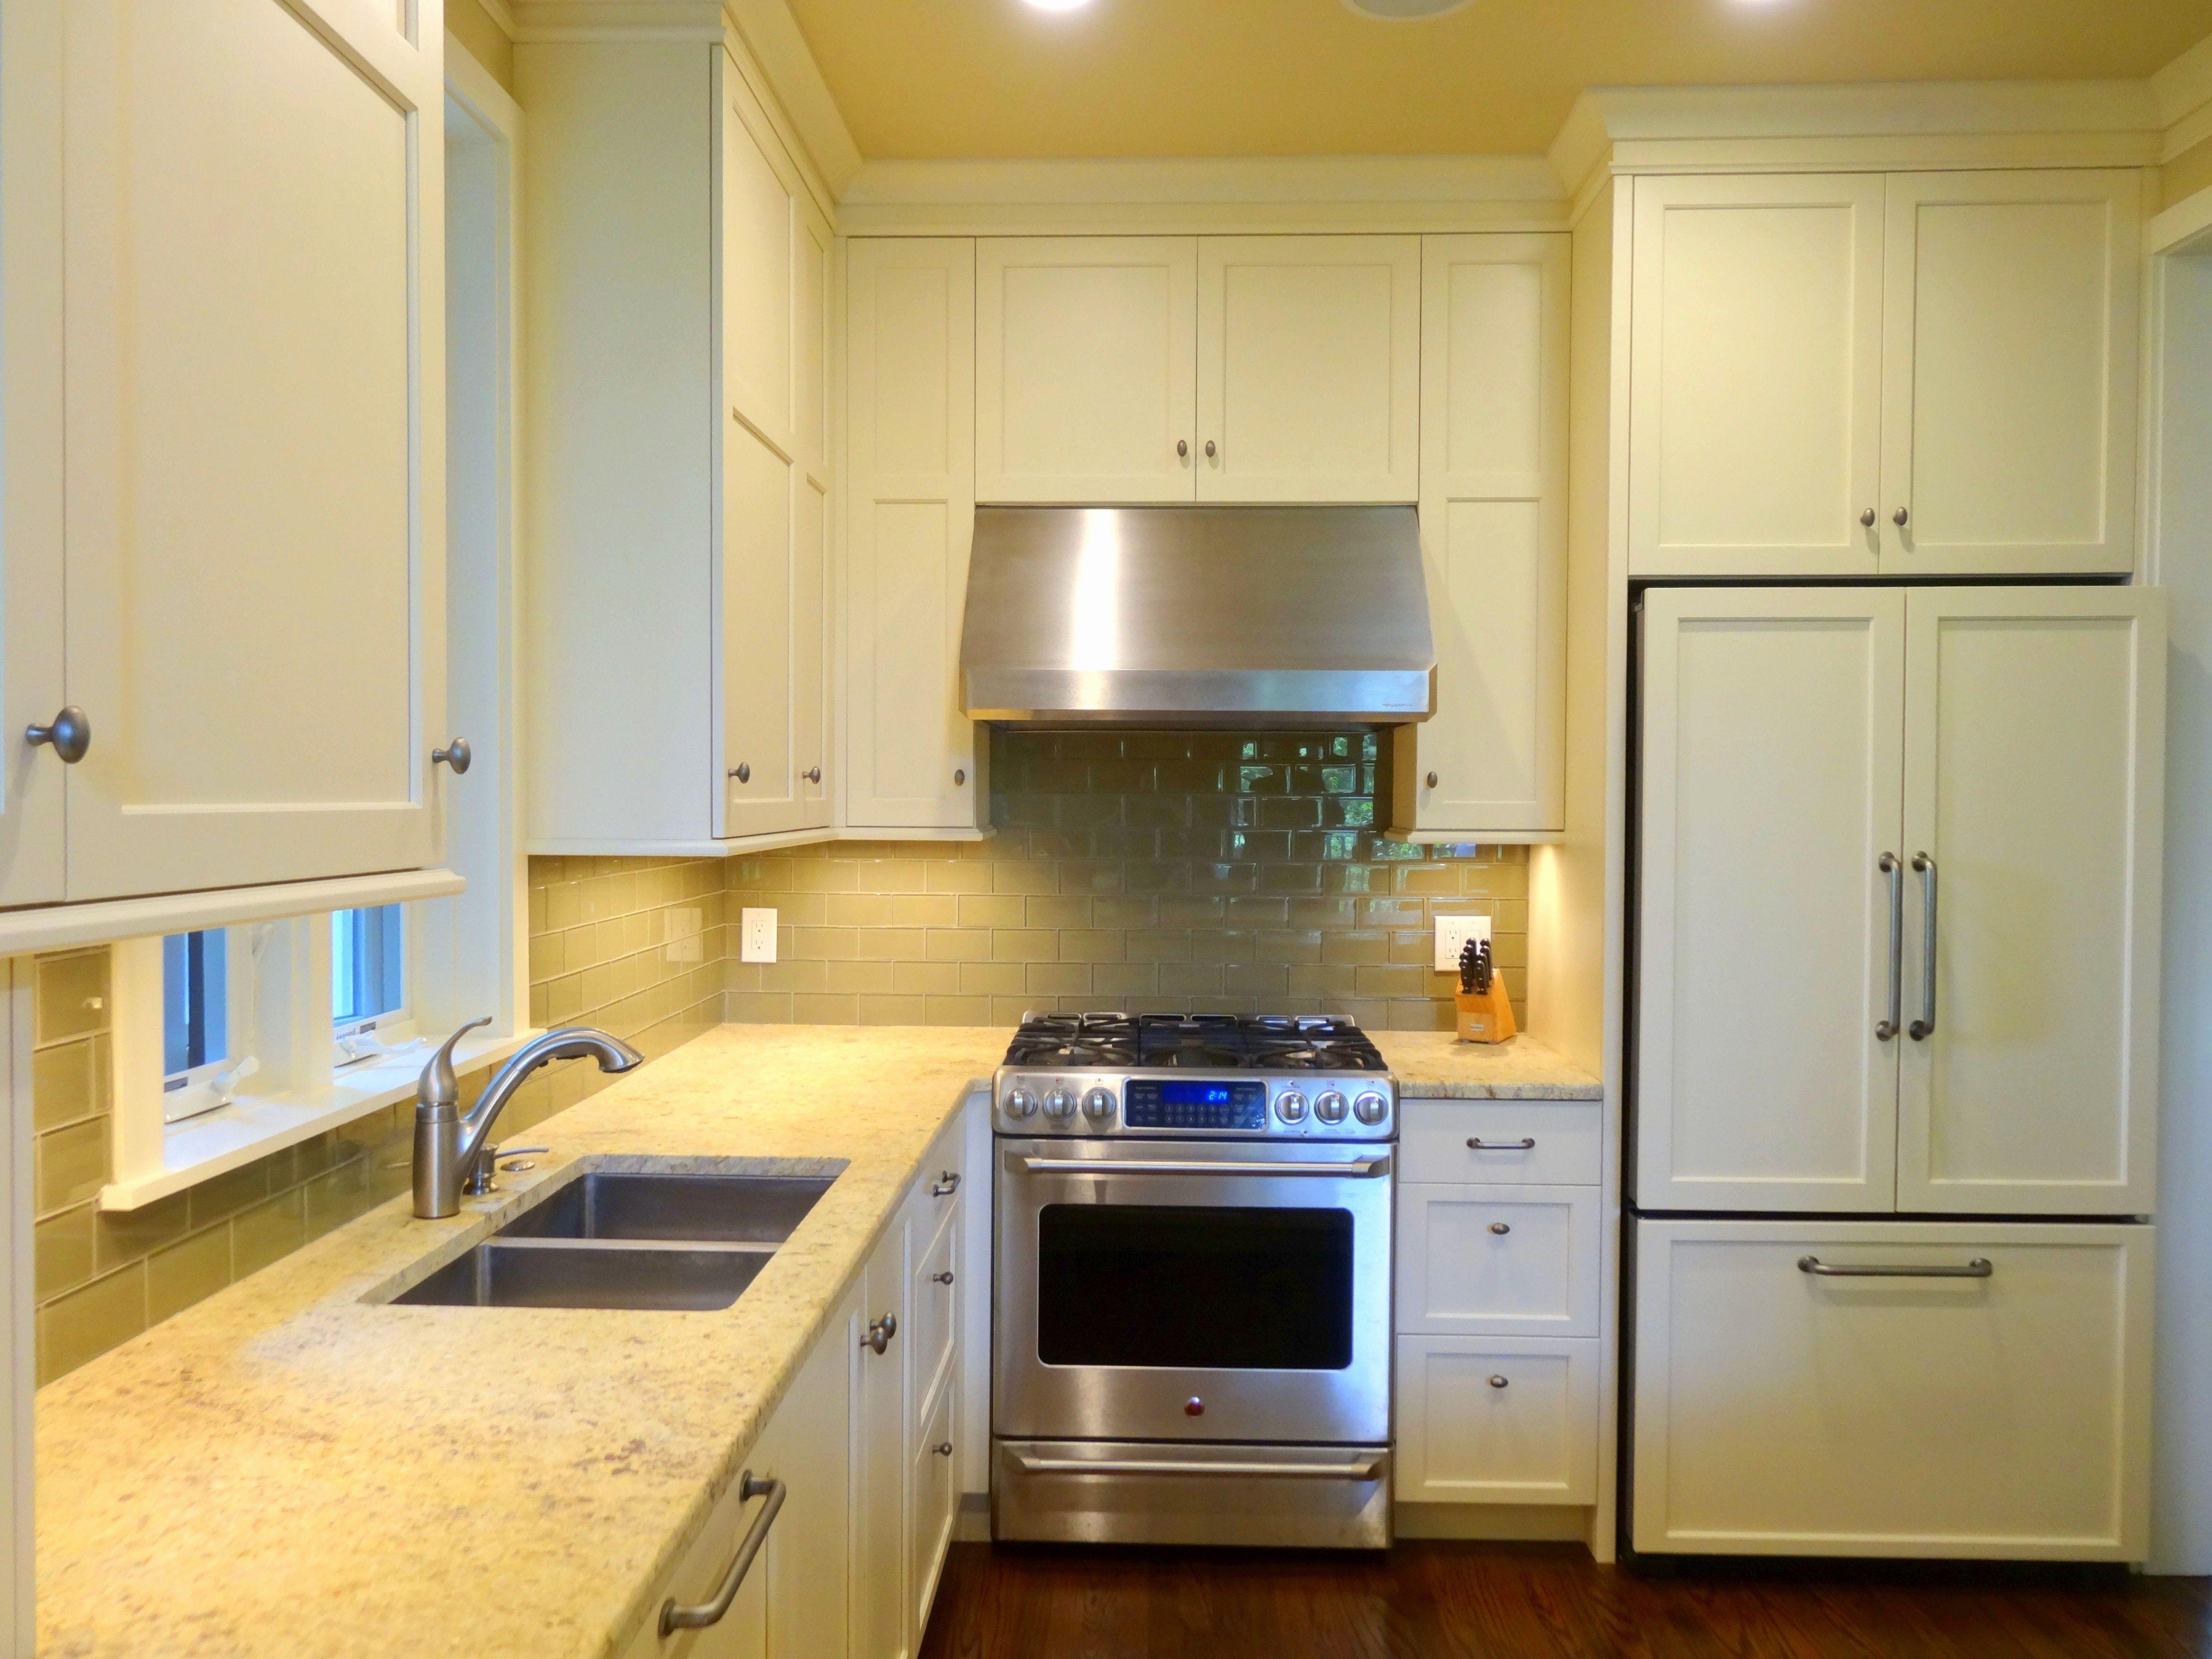 25 Beautiful Kitchen Kompact Cabinets Kitchen Cabinet Kitchen Furnishings Modern Grey Kitchen Kitchen Cabinet Design